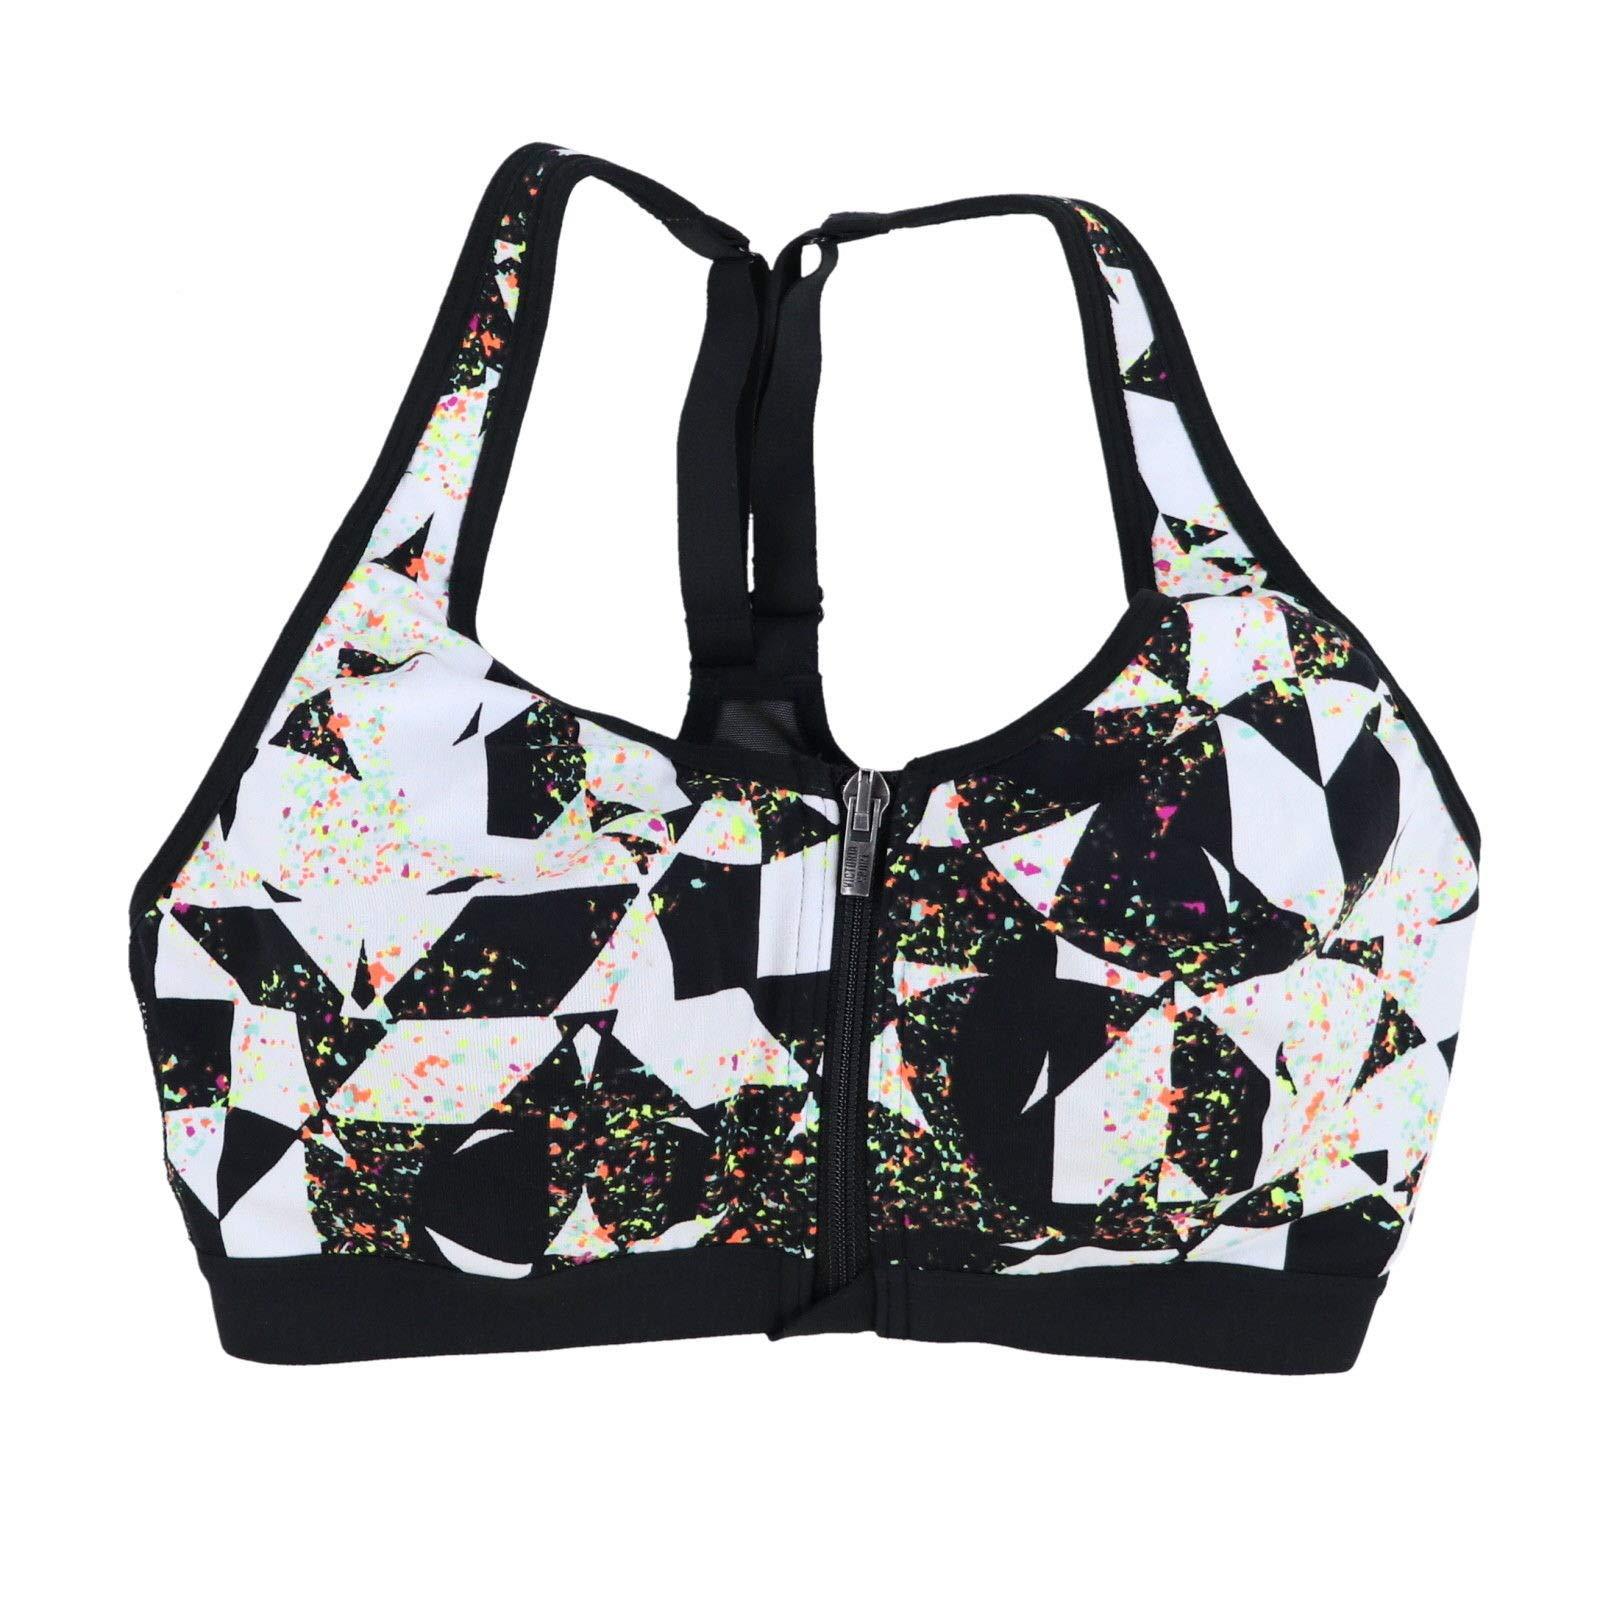 Victoria's Secret VSX Sports Bra Front Close Knockout (Checkered Paint Splash, 32C)